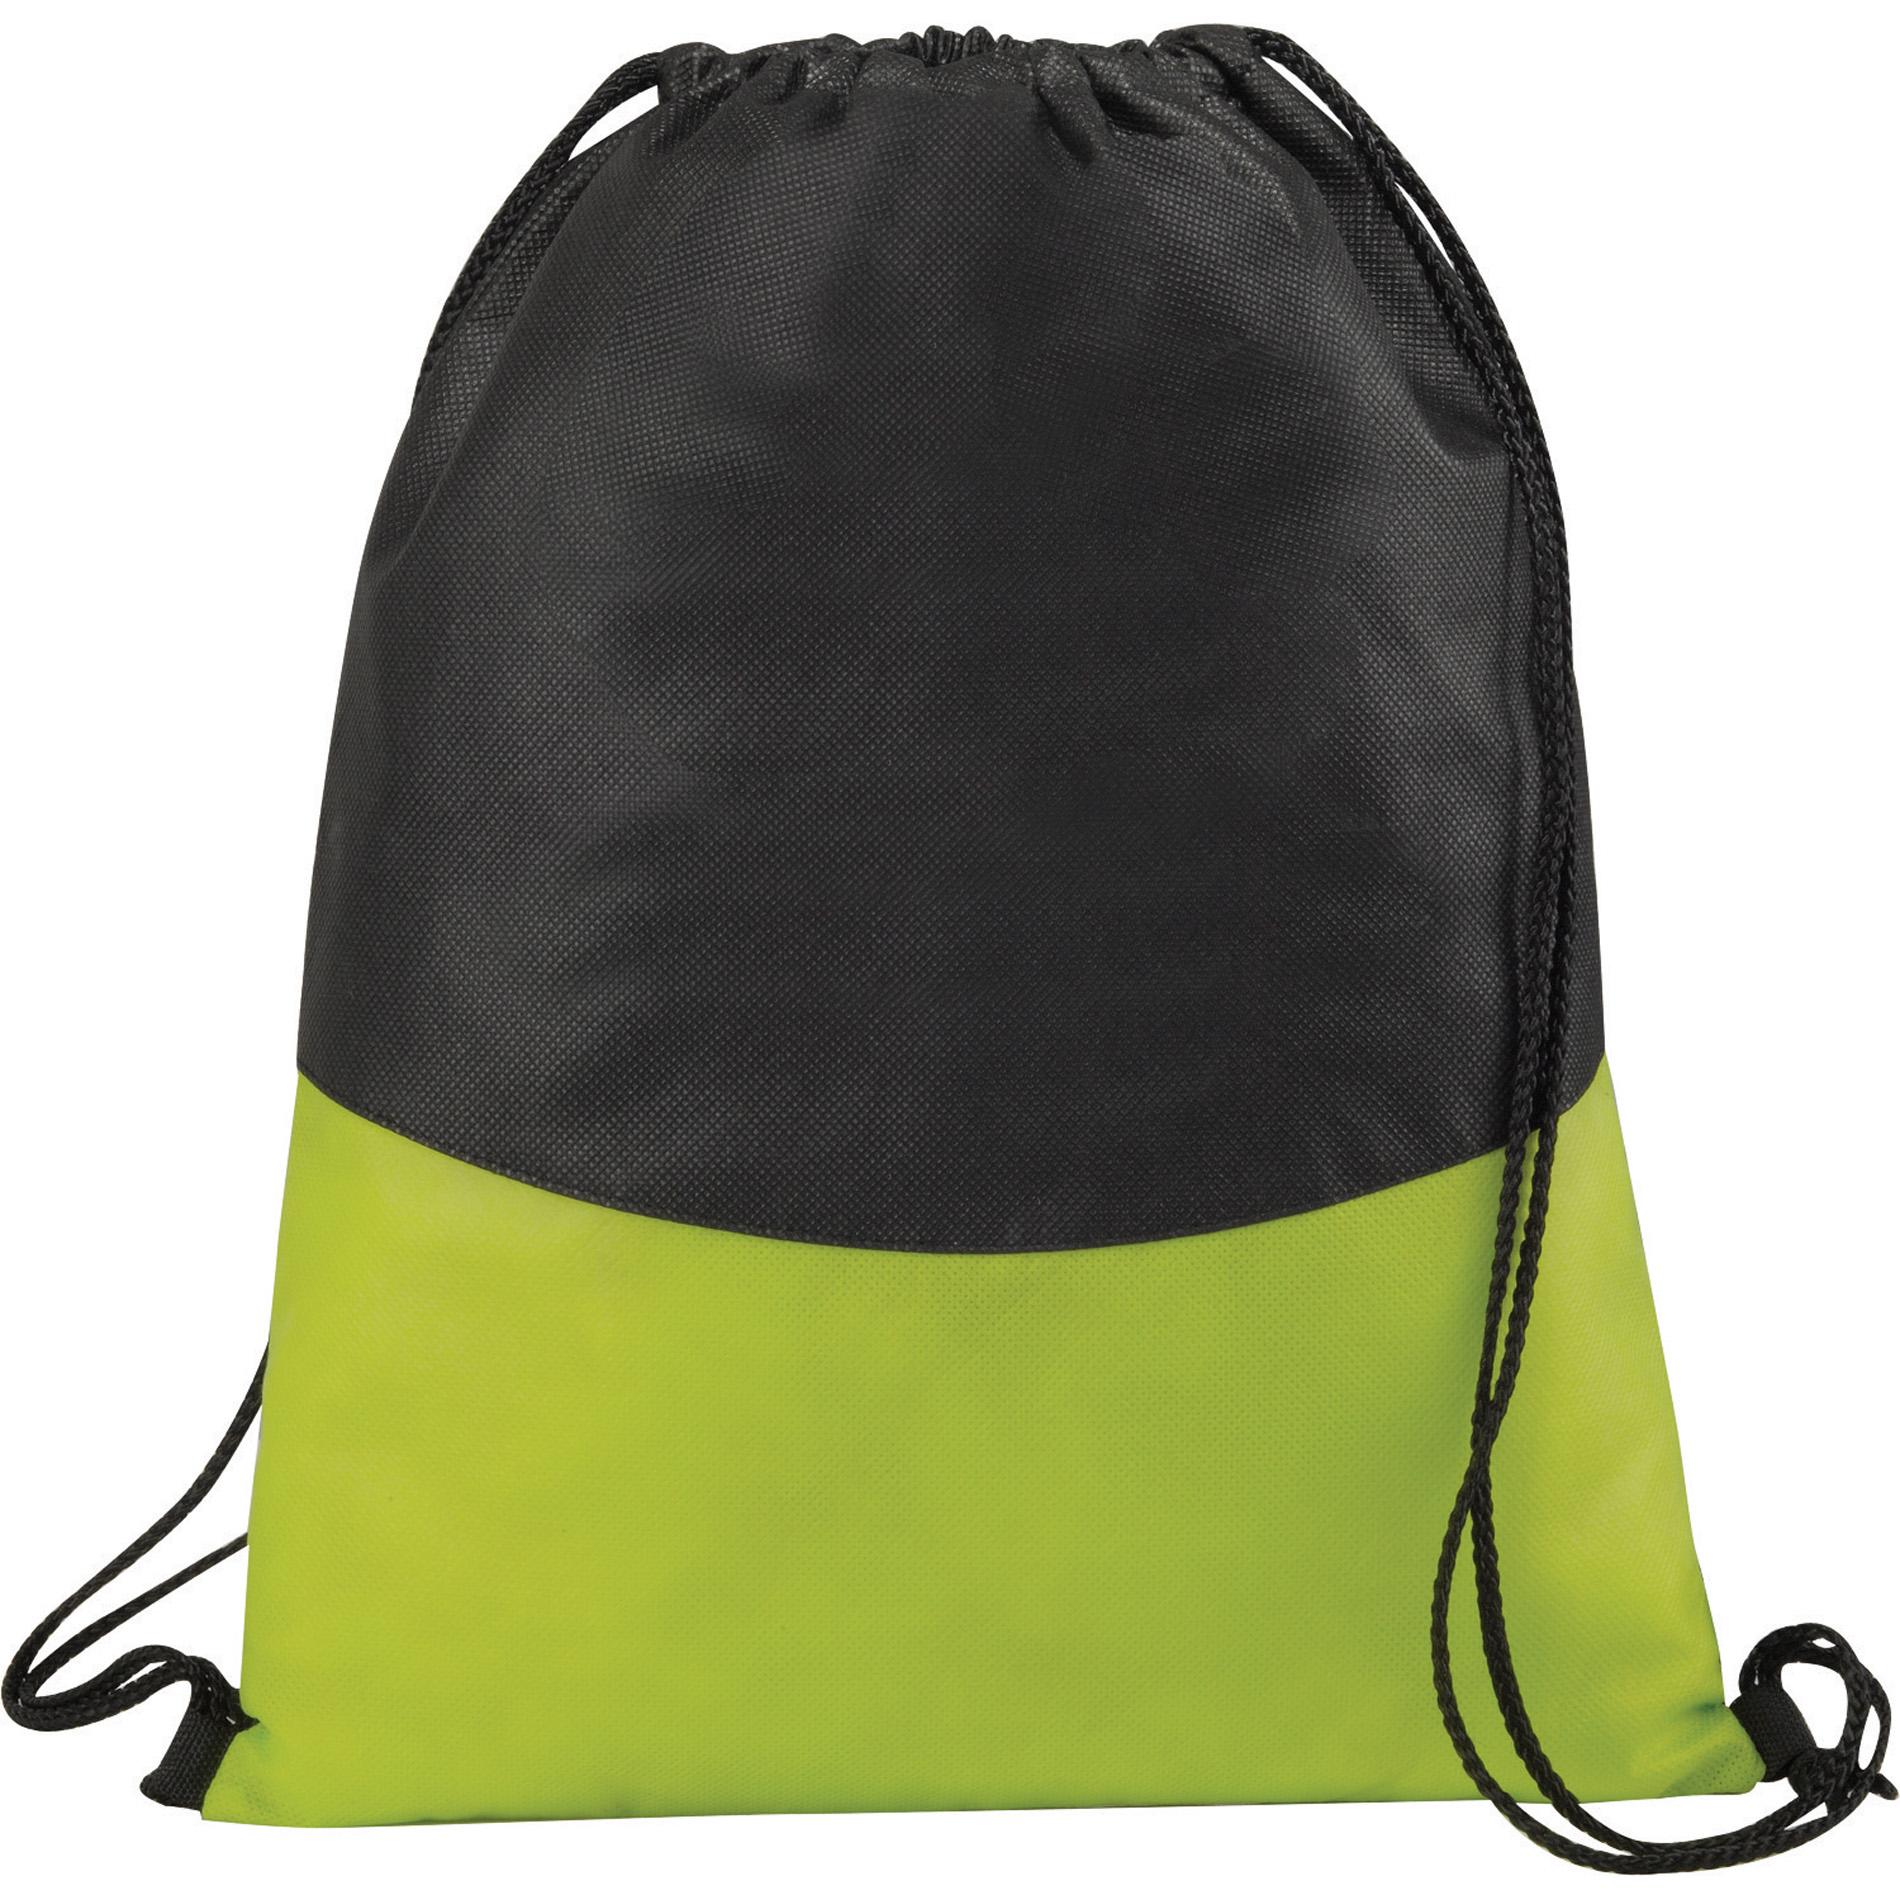 LEEDS 2150-98 - PolyPro Non-Woven Drawstring Sportspack